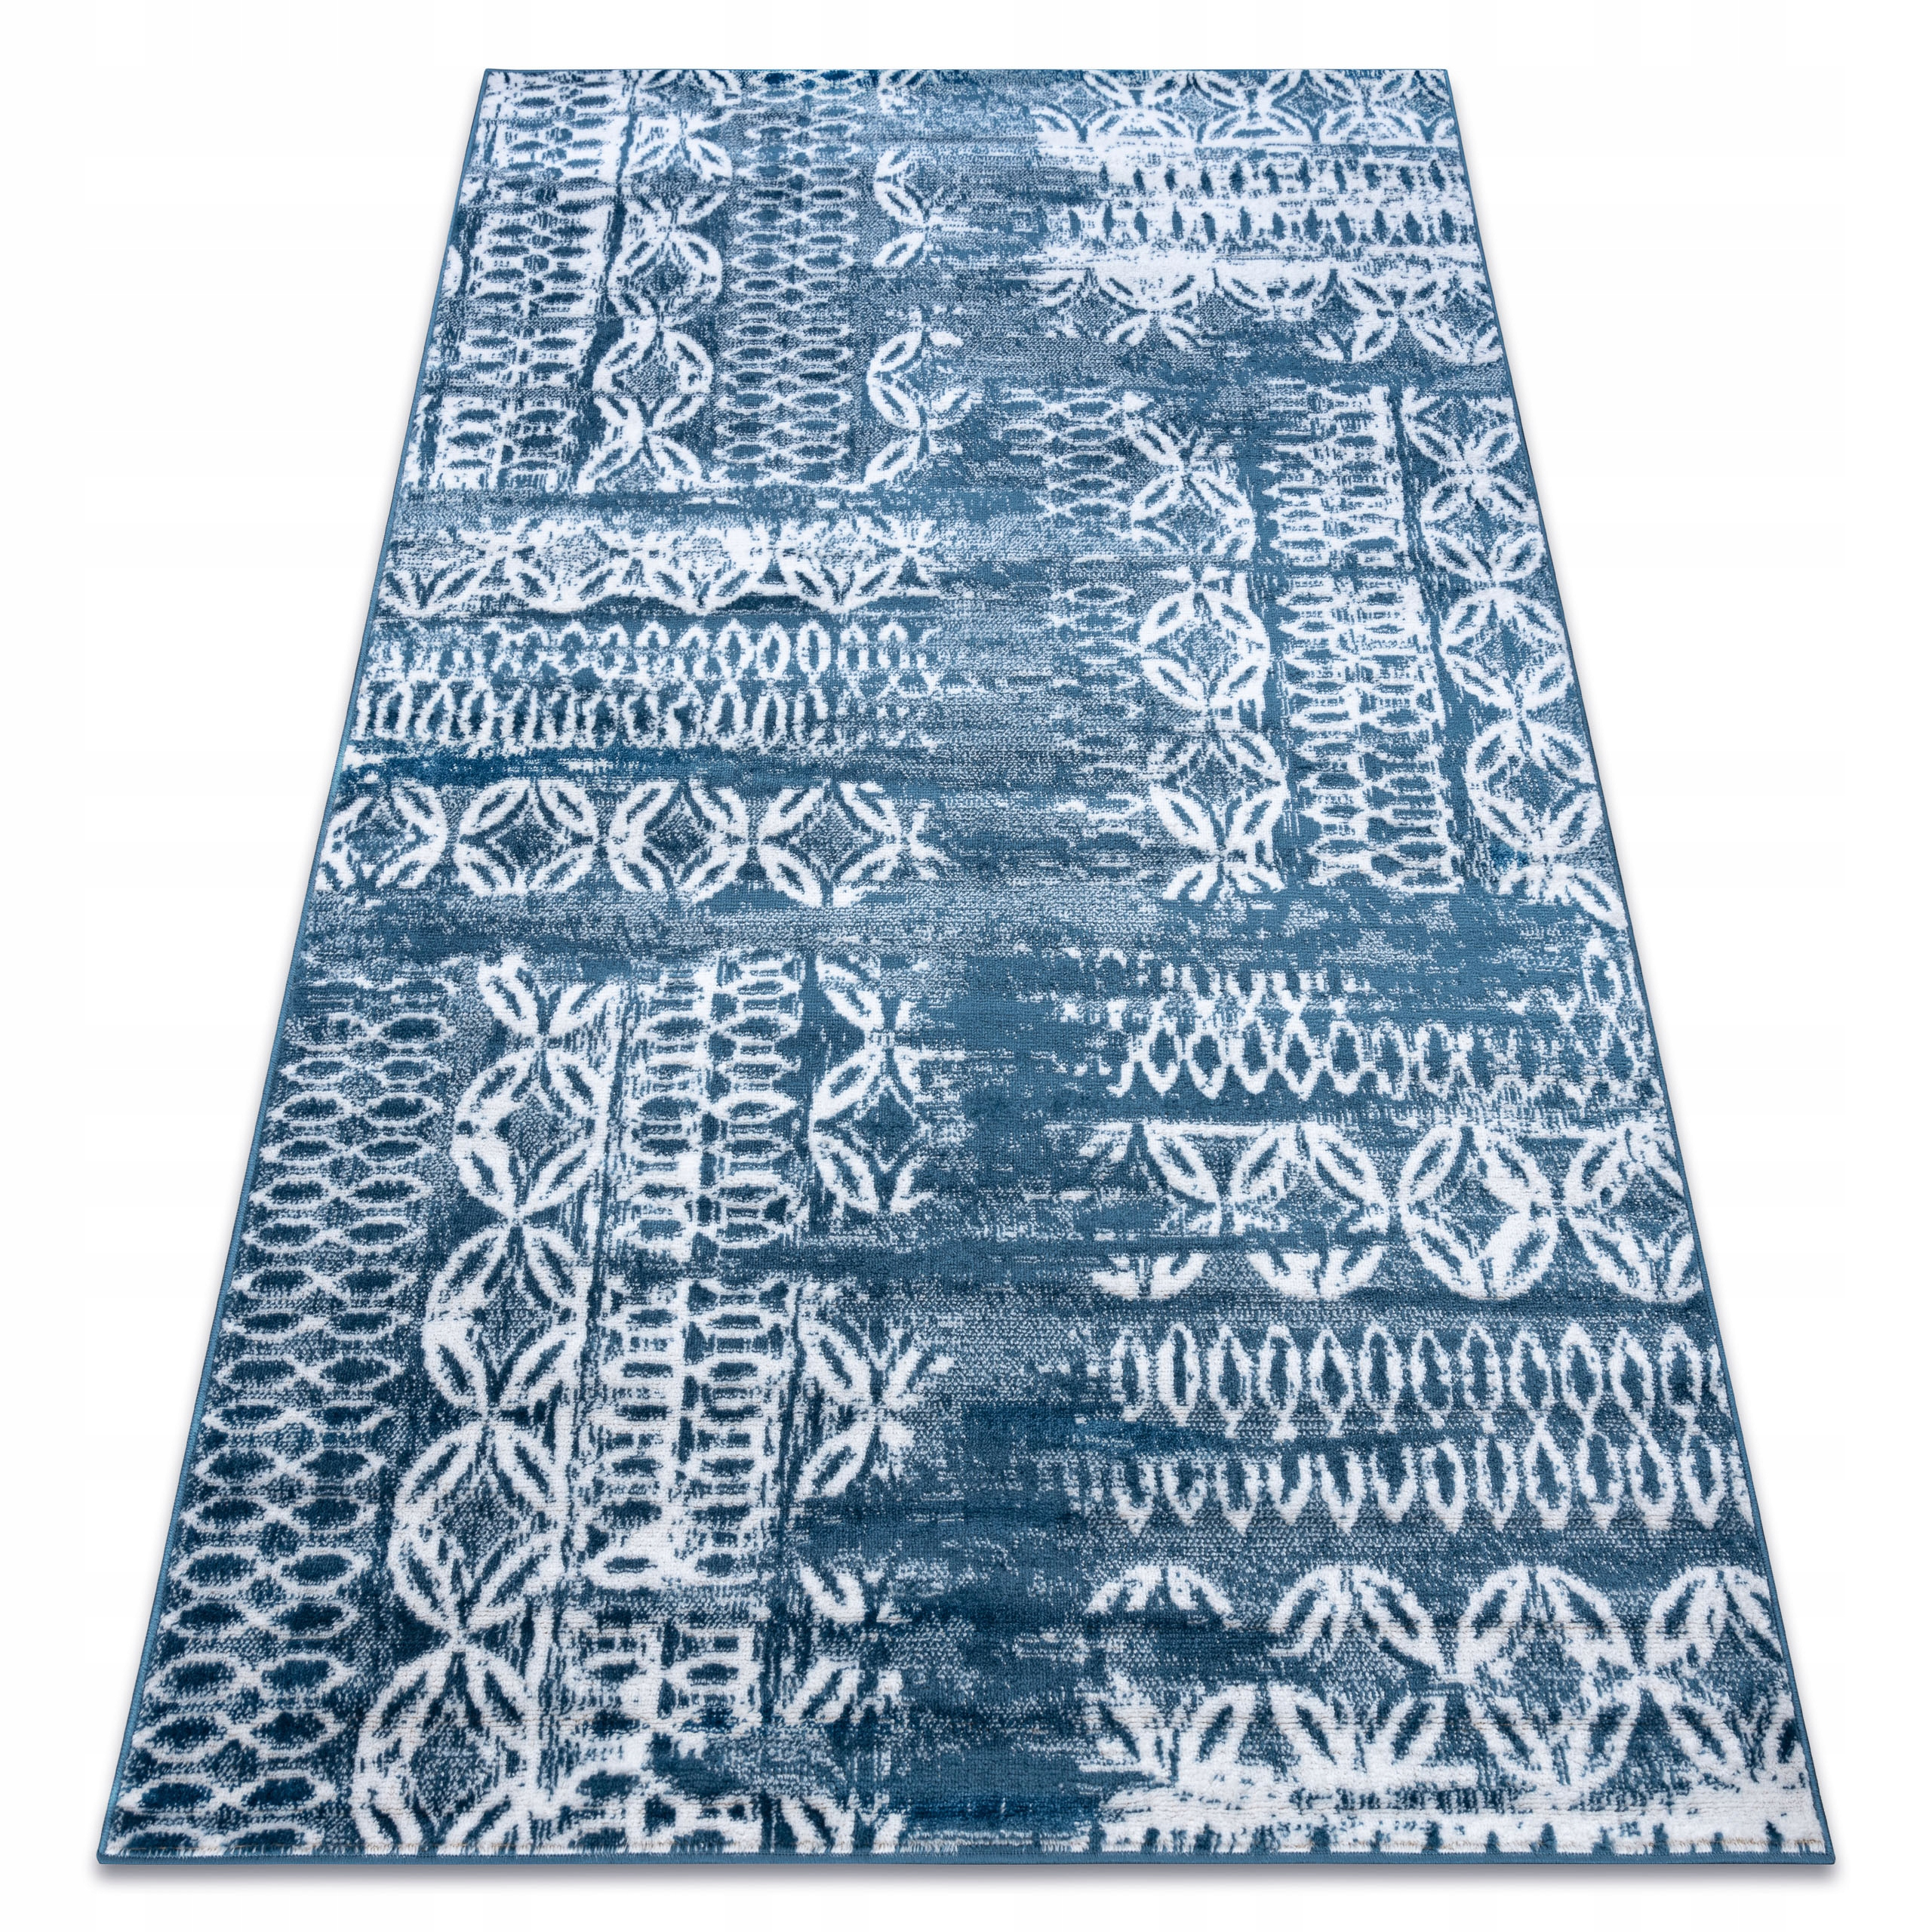 KOBEREC 120x170 RETRO VINTAGE blue #GR3364